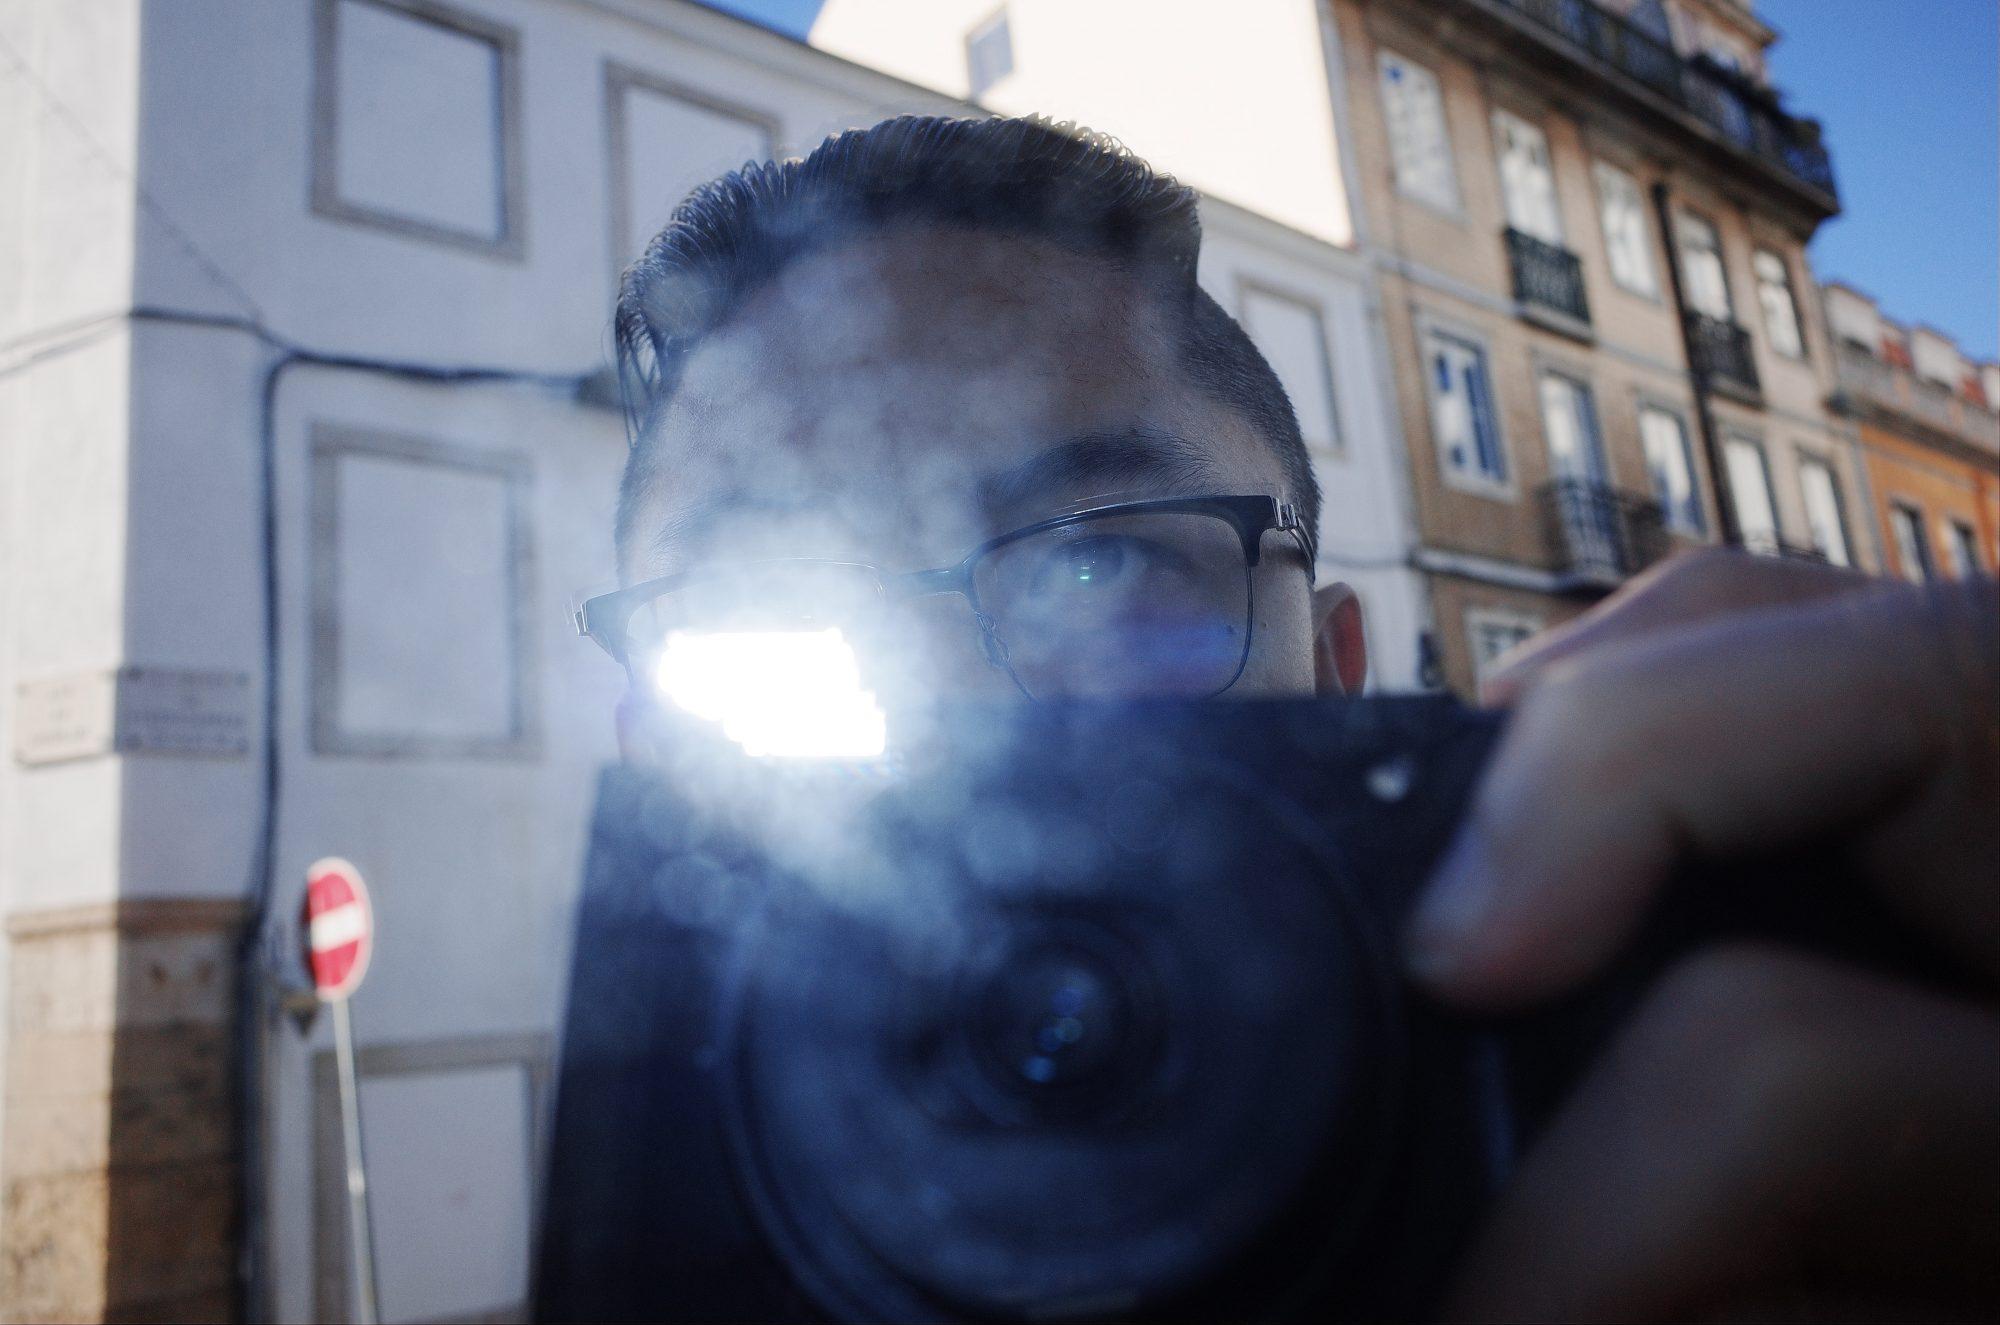 Eric kim selfie flash Ricoh gr Lisbon